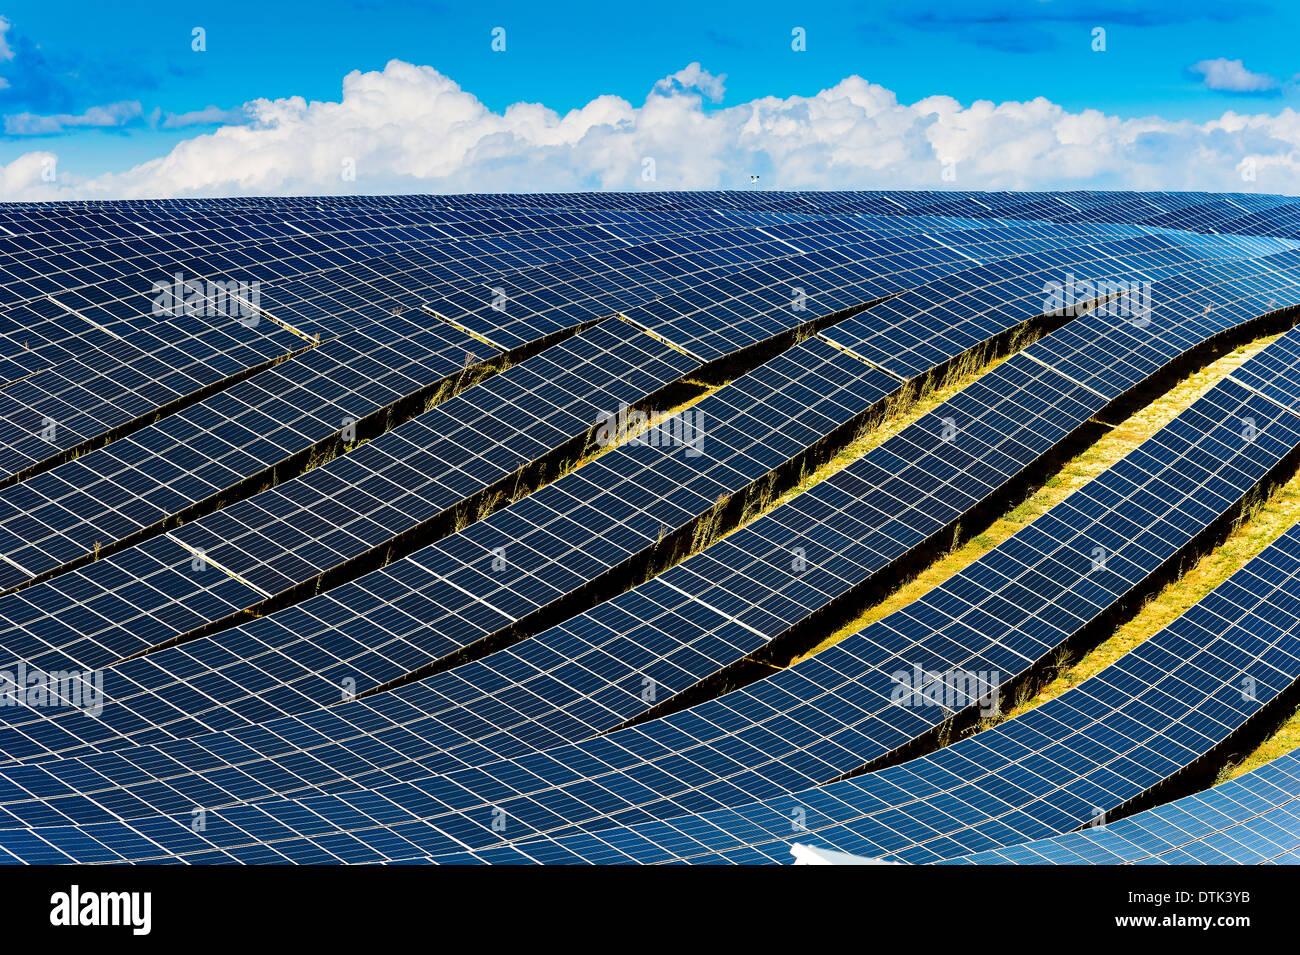 Europa, Francia, Alpes de Haute Provence región Puimichel, el MEES Granja Solar, paneles solares. Imagen De Stock